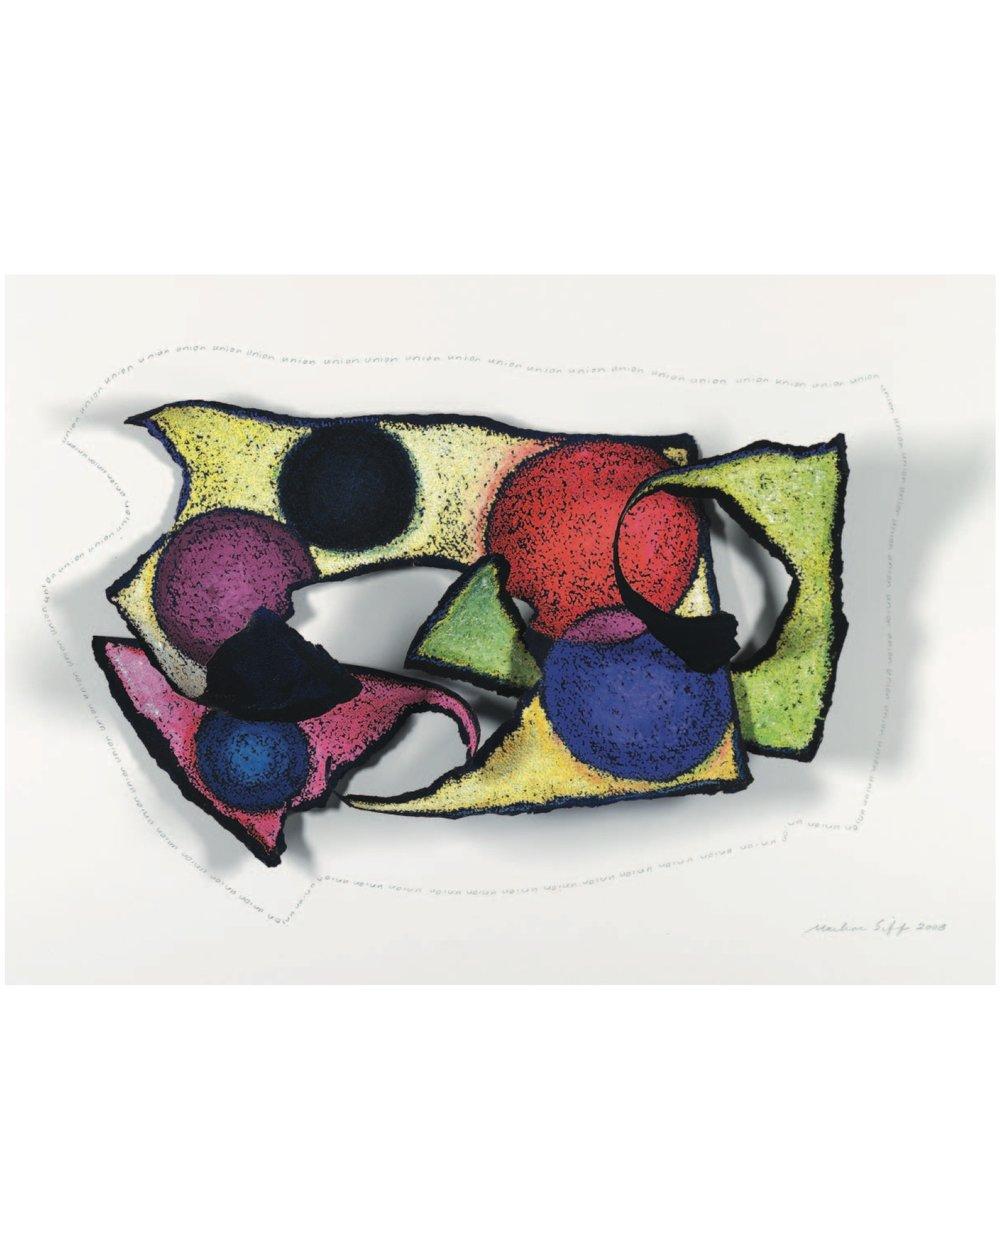 "Marlene Siff    Union  , watercolor, oil pastel, graphite, torn paper, 12""x18""x3"", 2008"